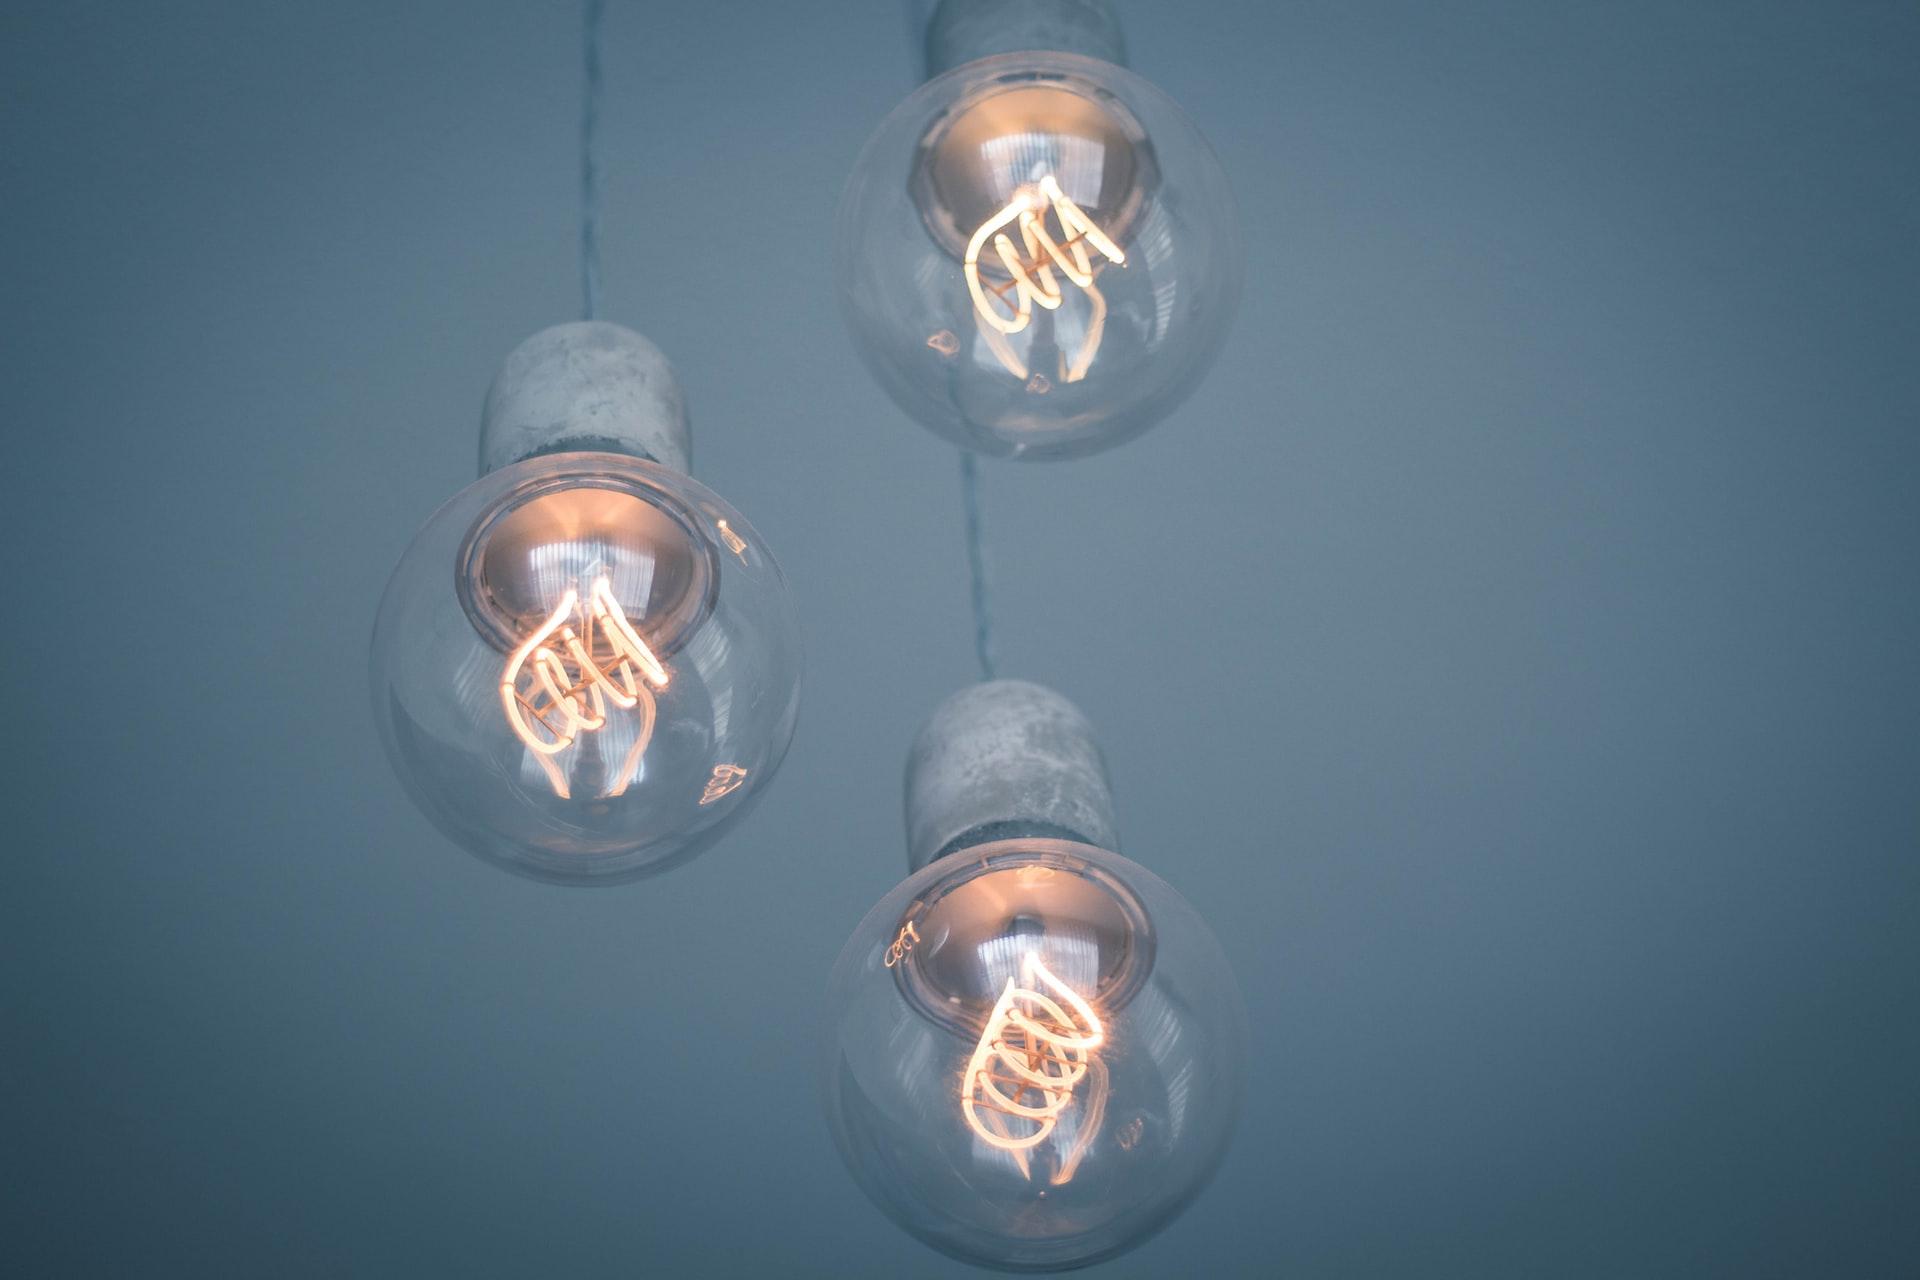 bombillas-luces.jpg